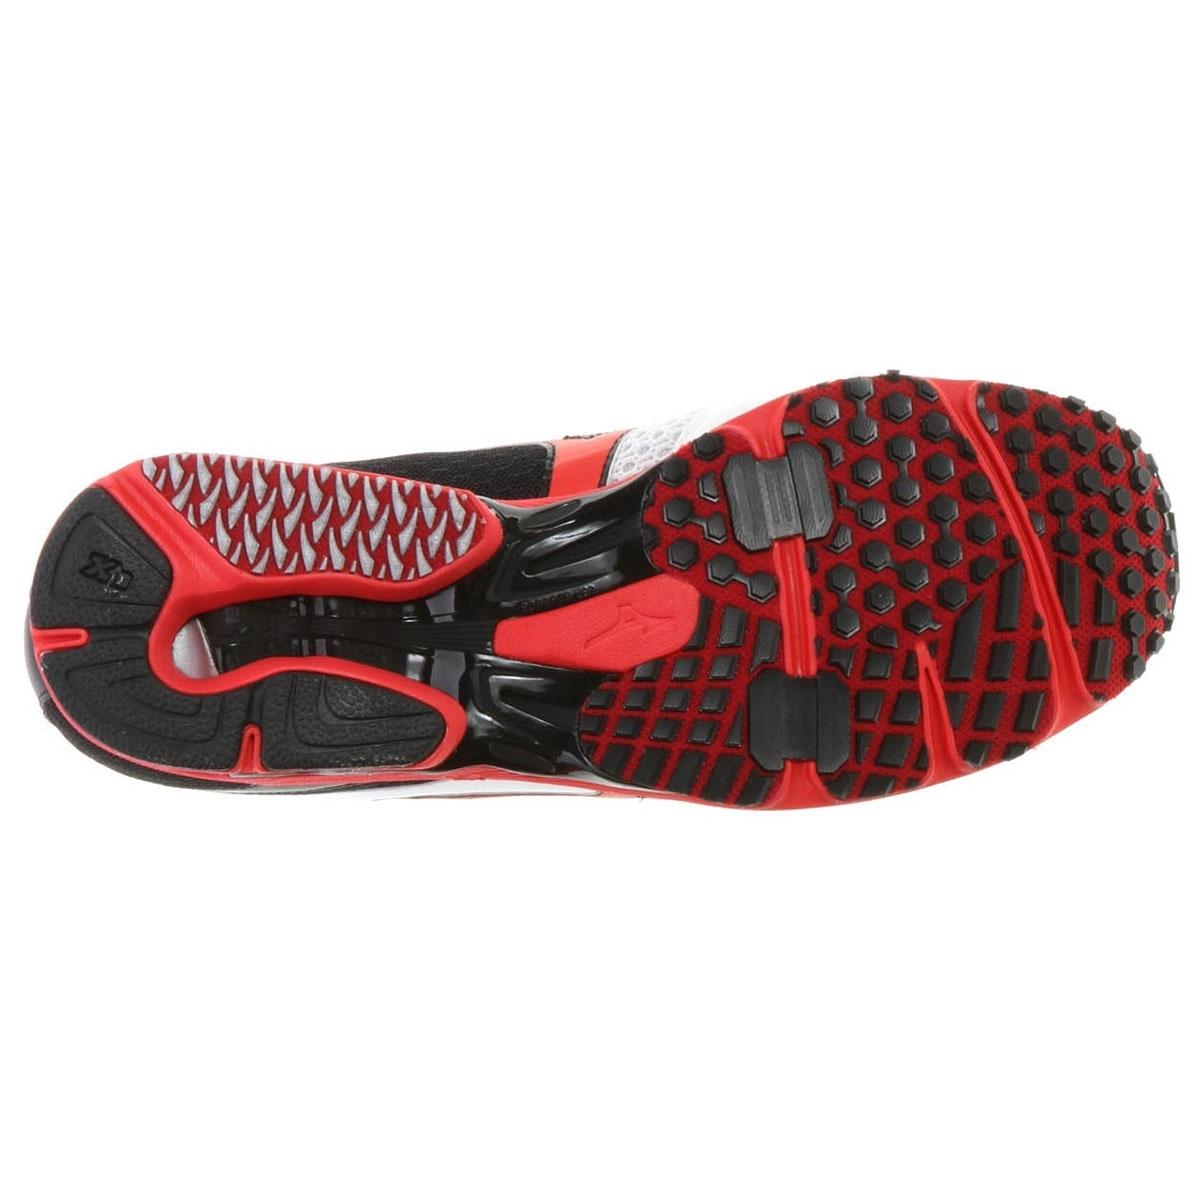 Кроссовки для бега Mizuno Wave Ronin 4 Марафонки red